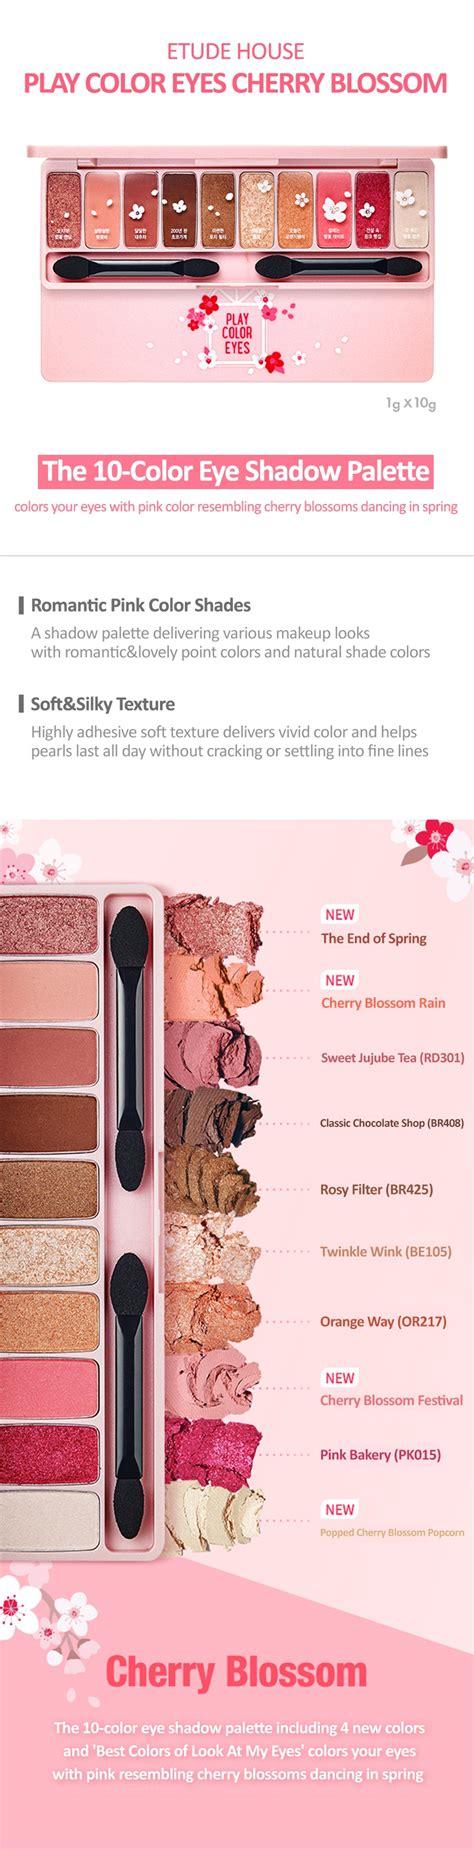 Etude House Play Color Eyeshadow Cherry Blossom Pink etude house play color cherry blossom eye palette